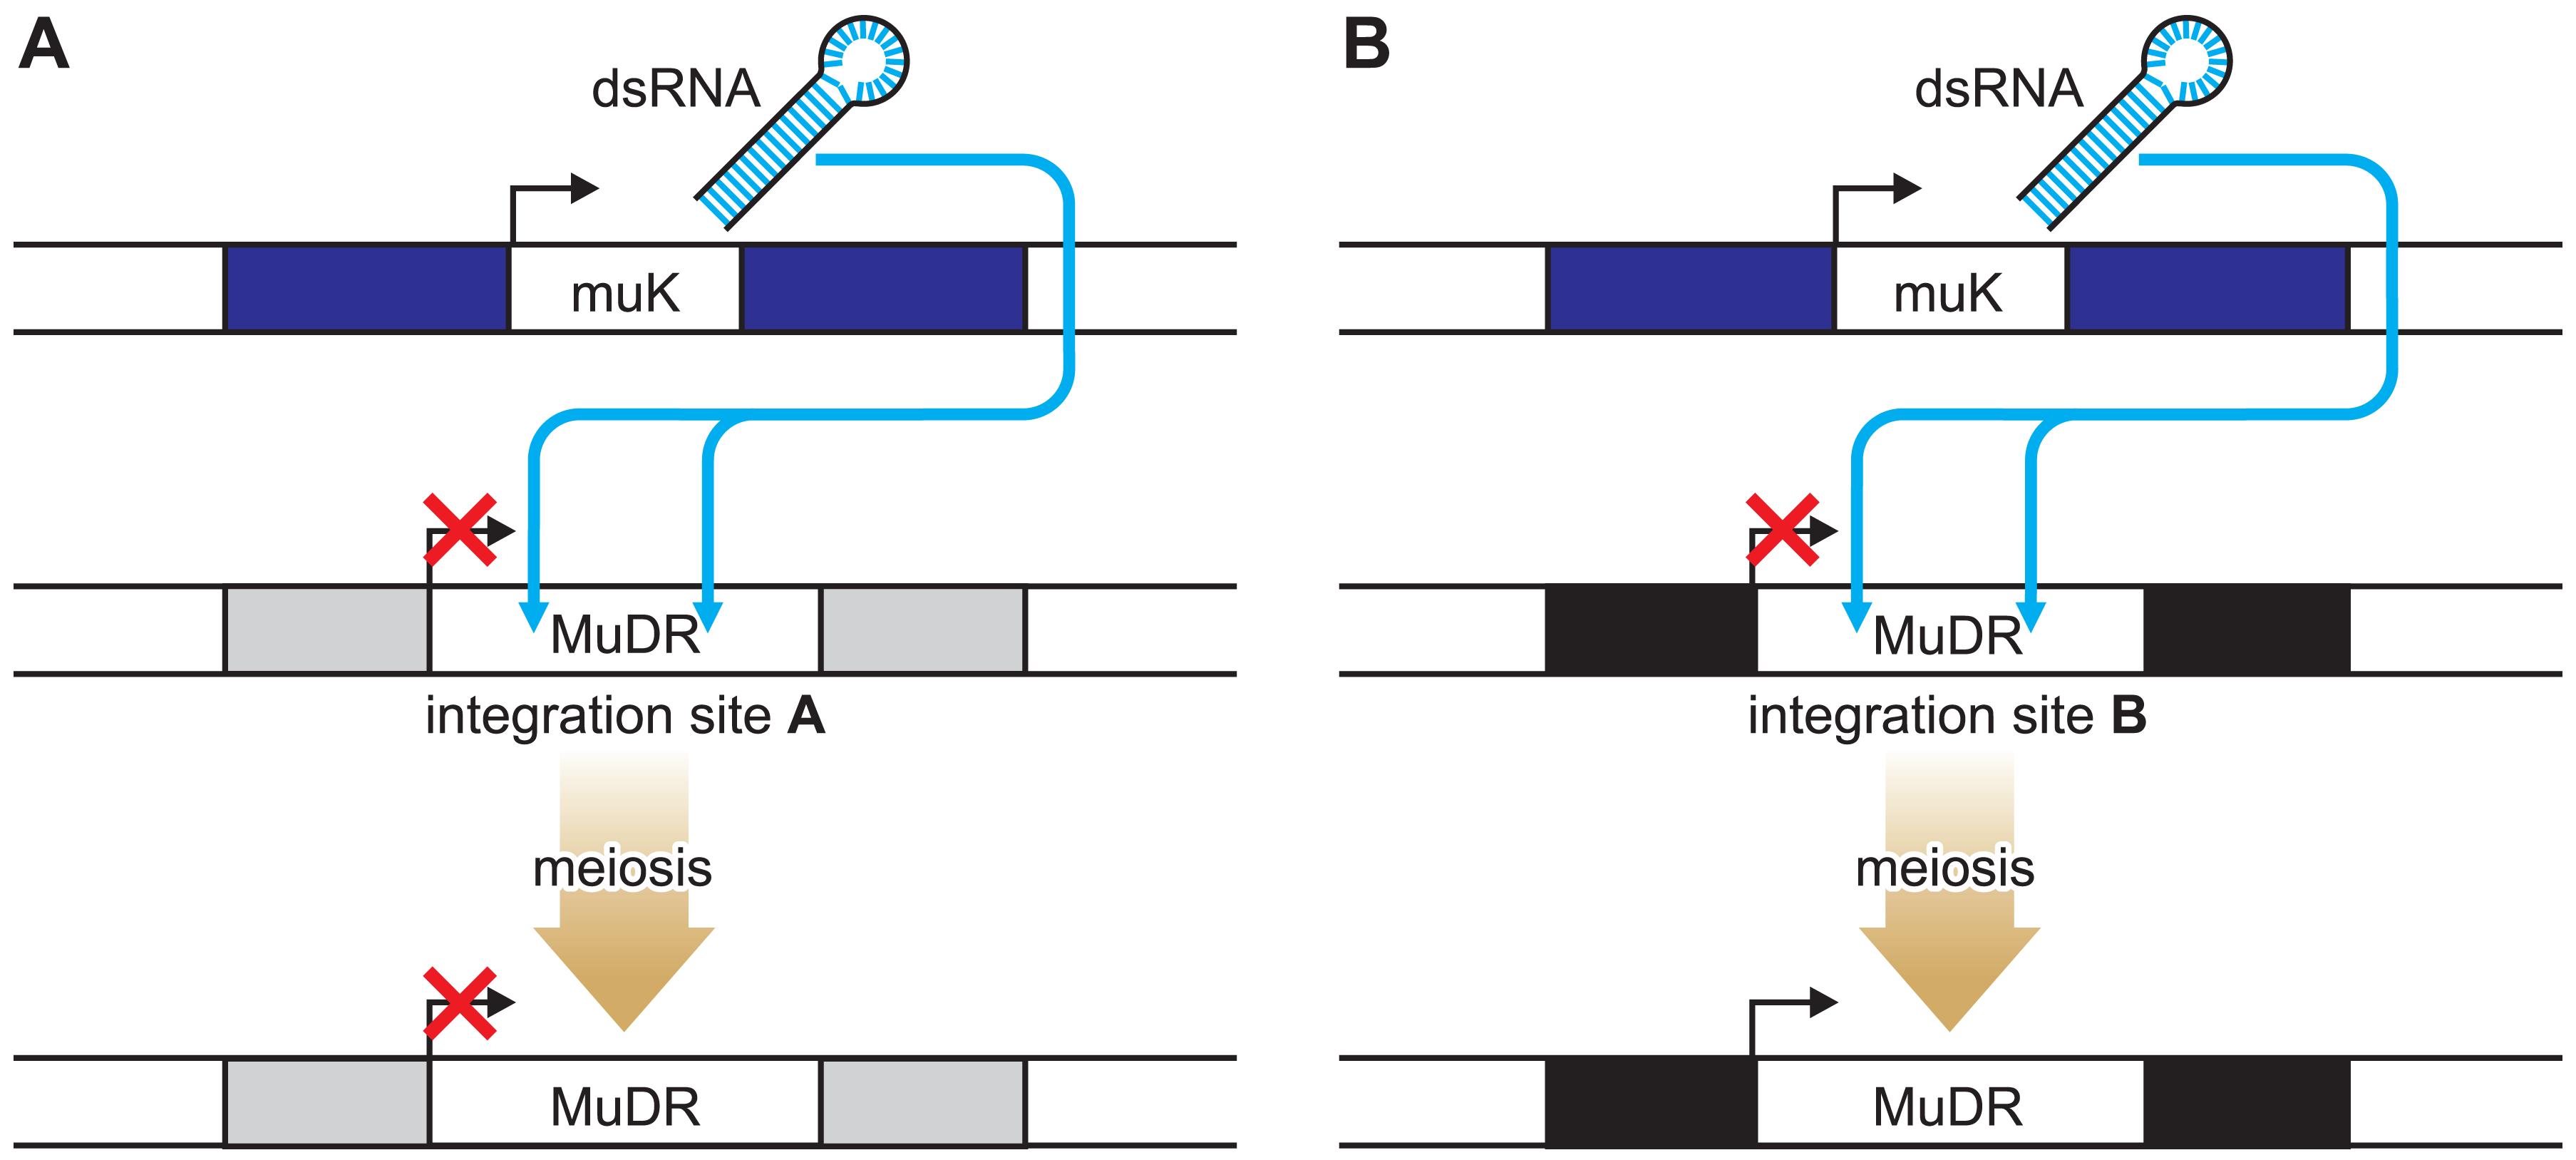 Locus-Specific Reactivation of the MuDR Transposon.